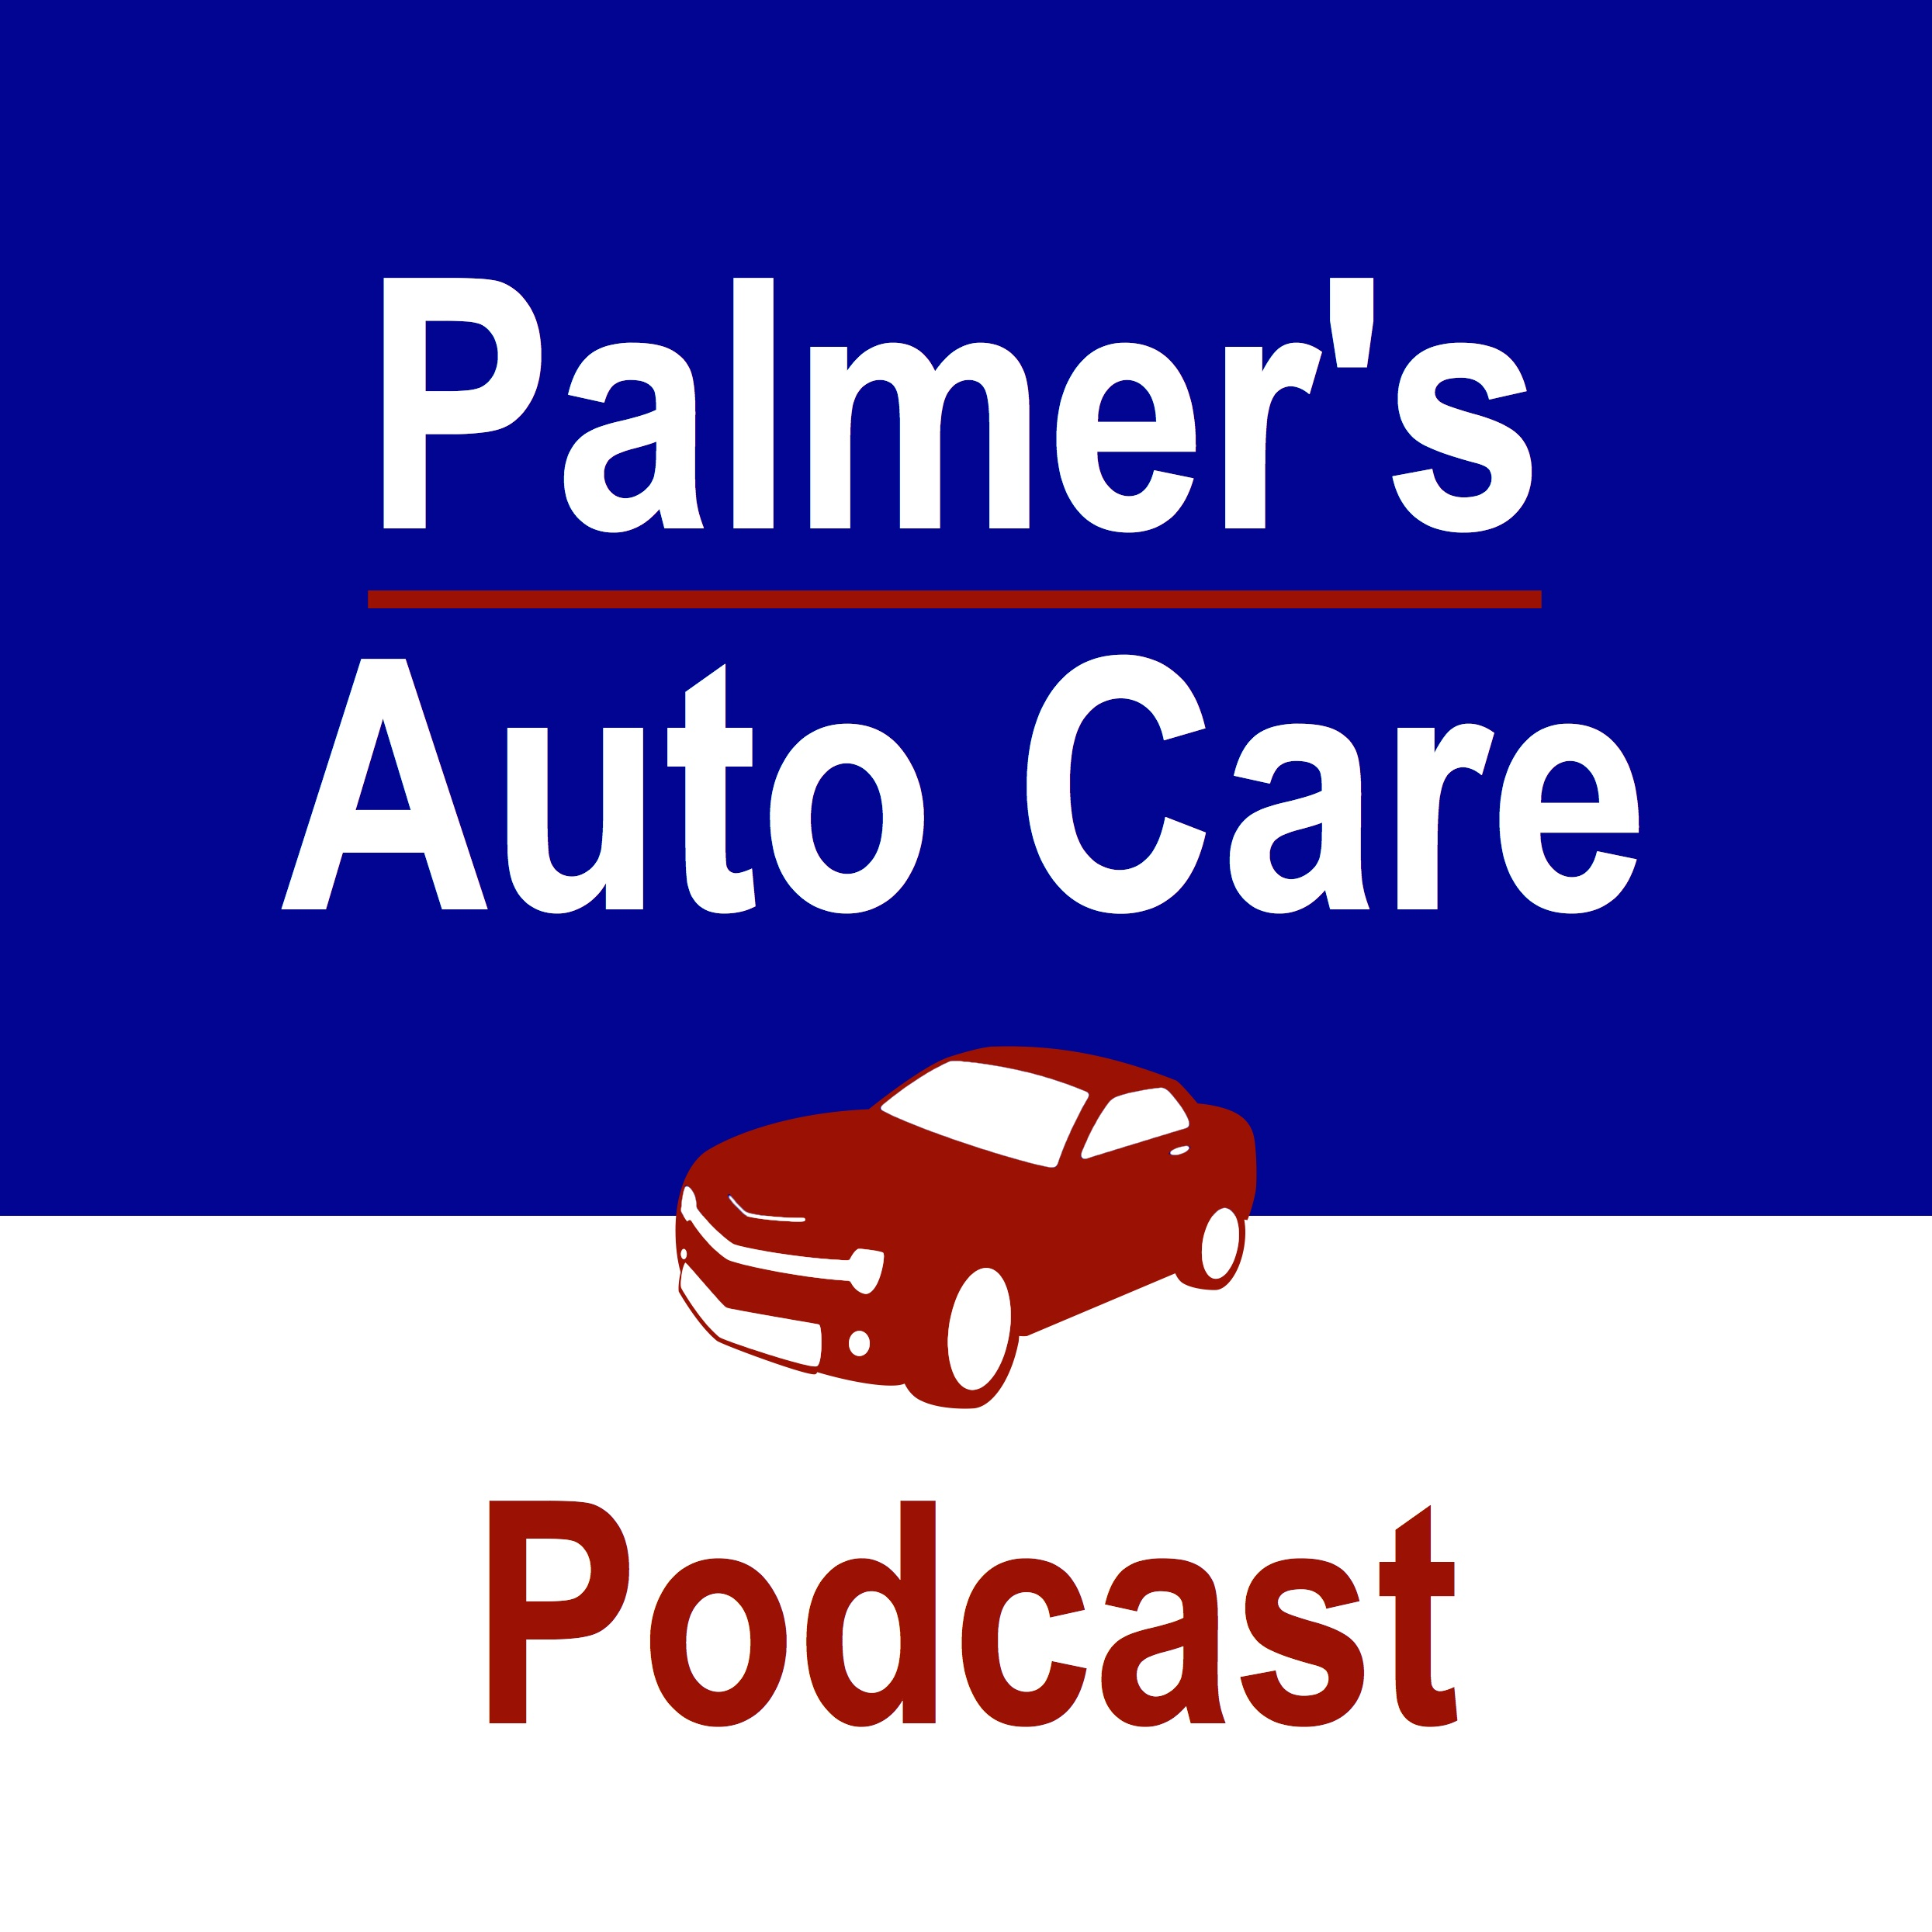 Palmer's Auto Care Podcast